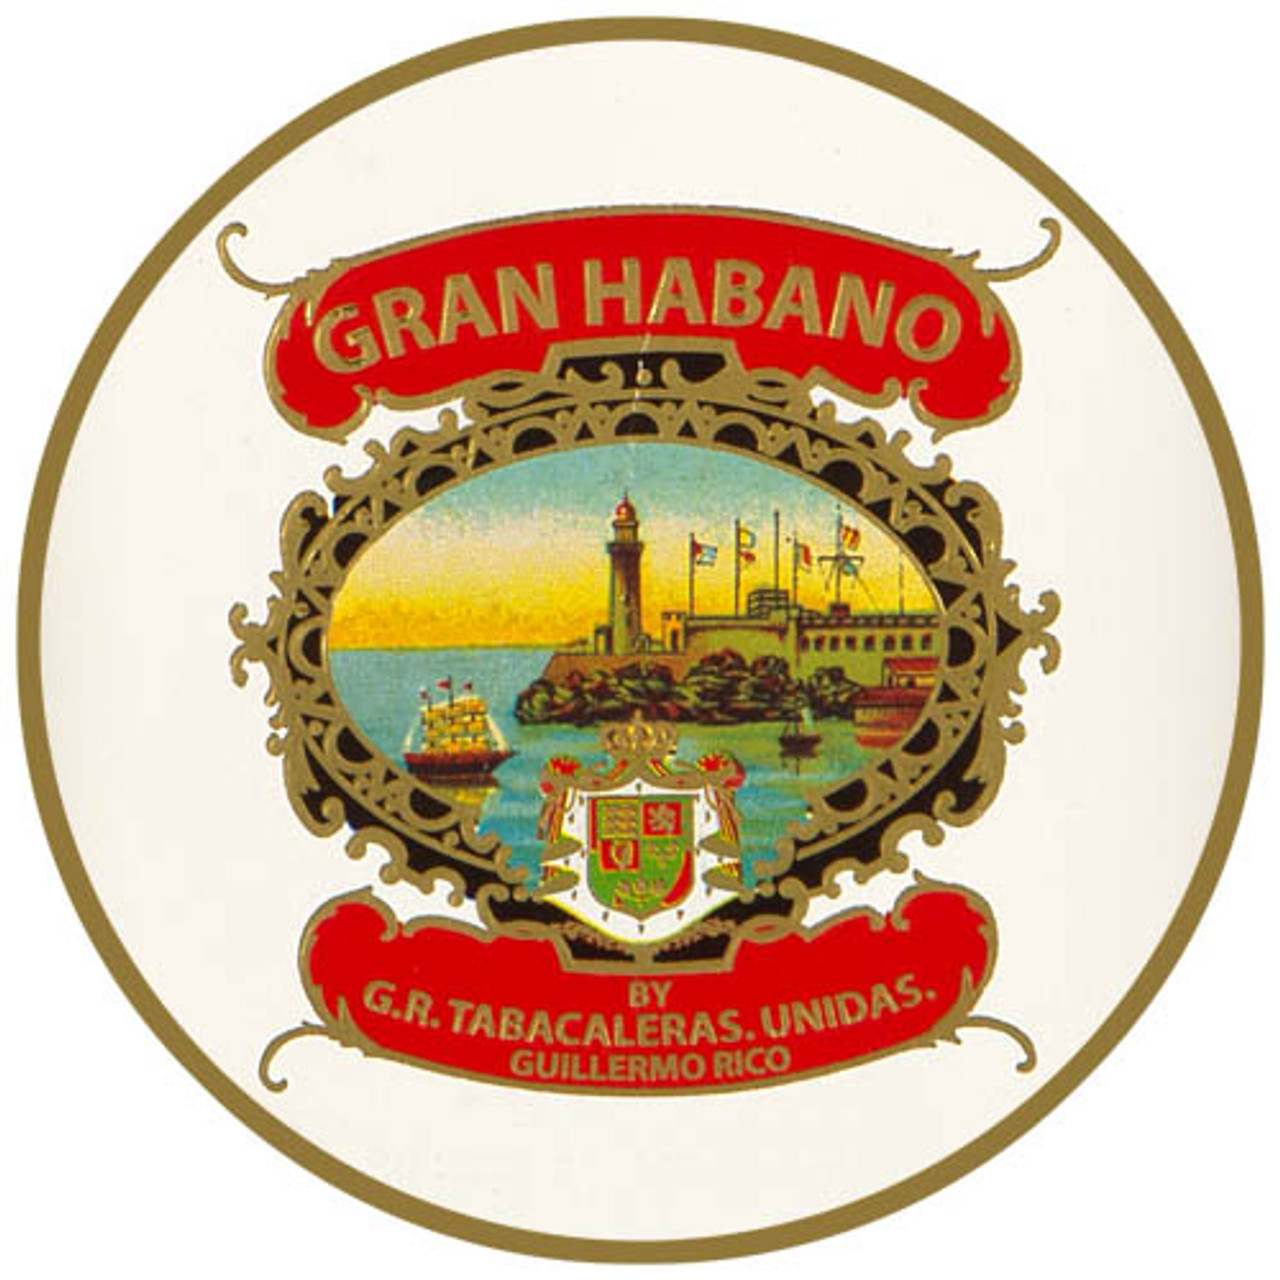 Gran Habano #5 Corojo Grandioso Cigars - 70 x 70 (Box of 20)